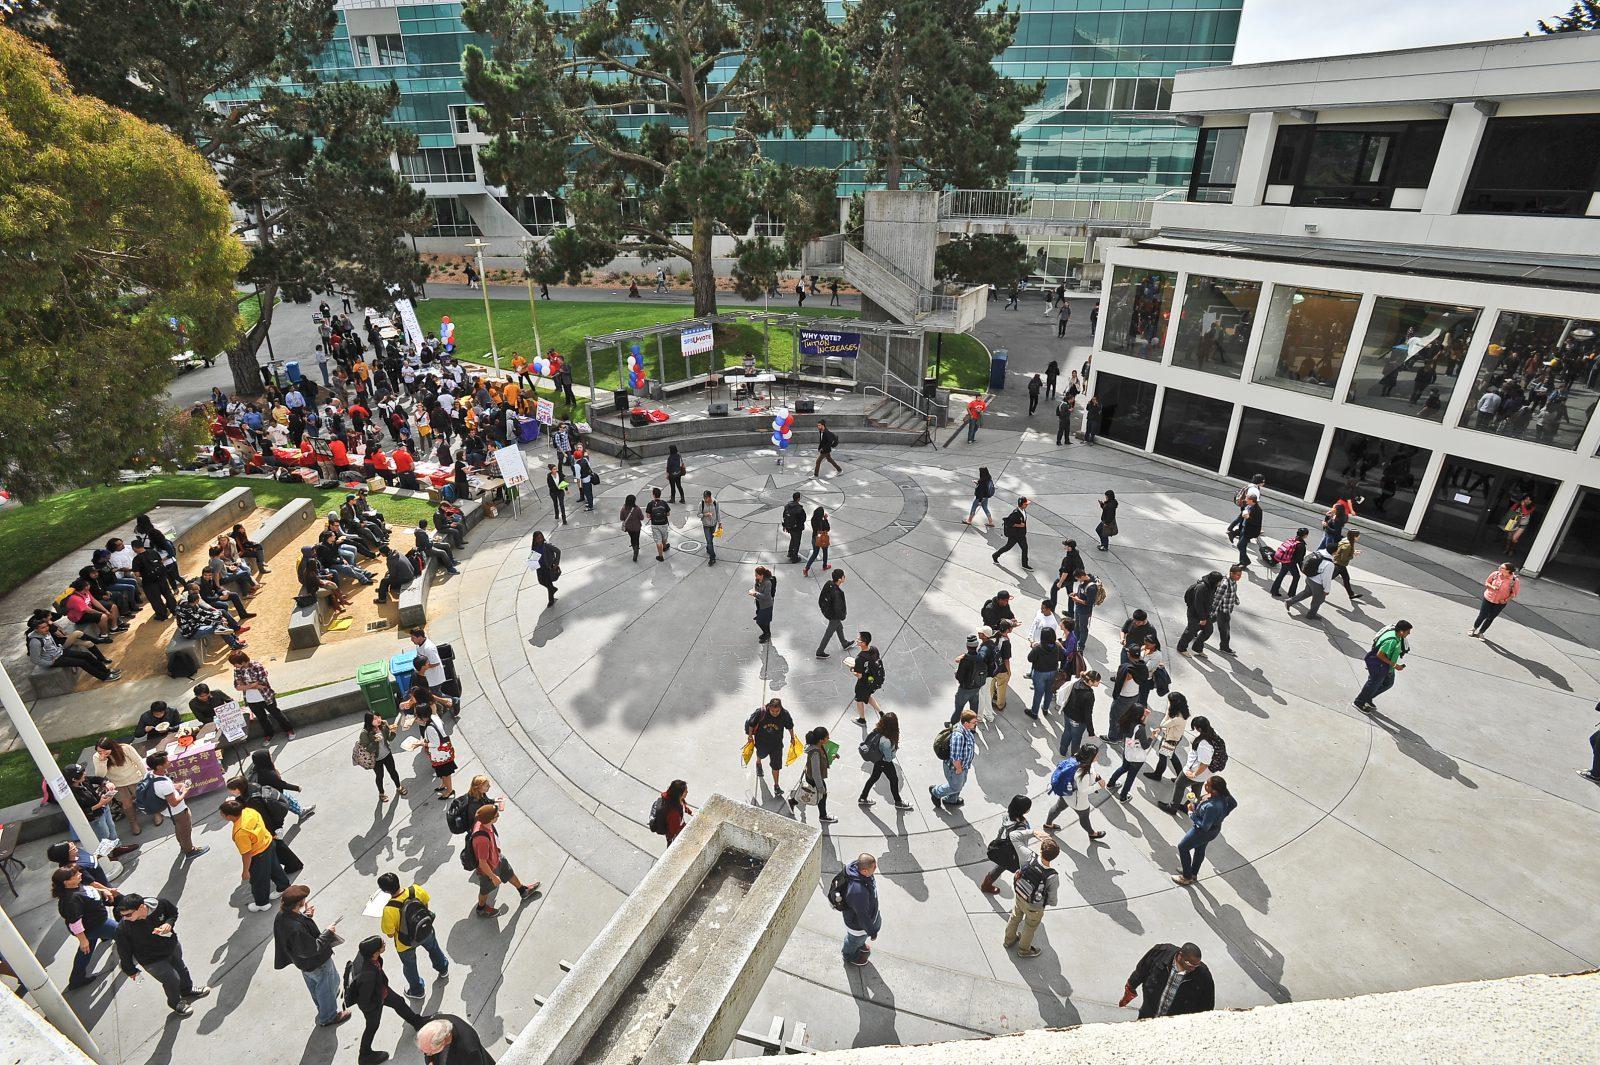 Malcolm X Plaza på San Francisco State Campus